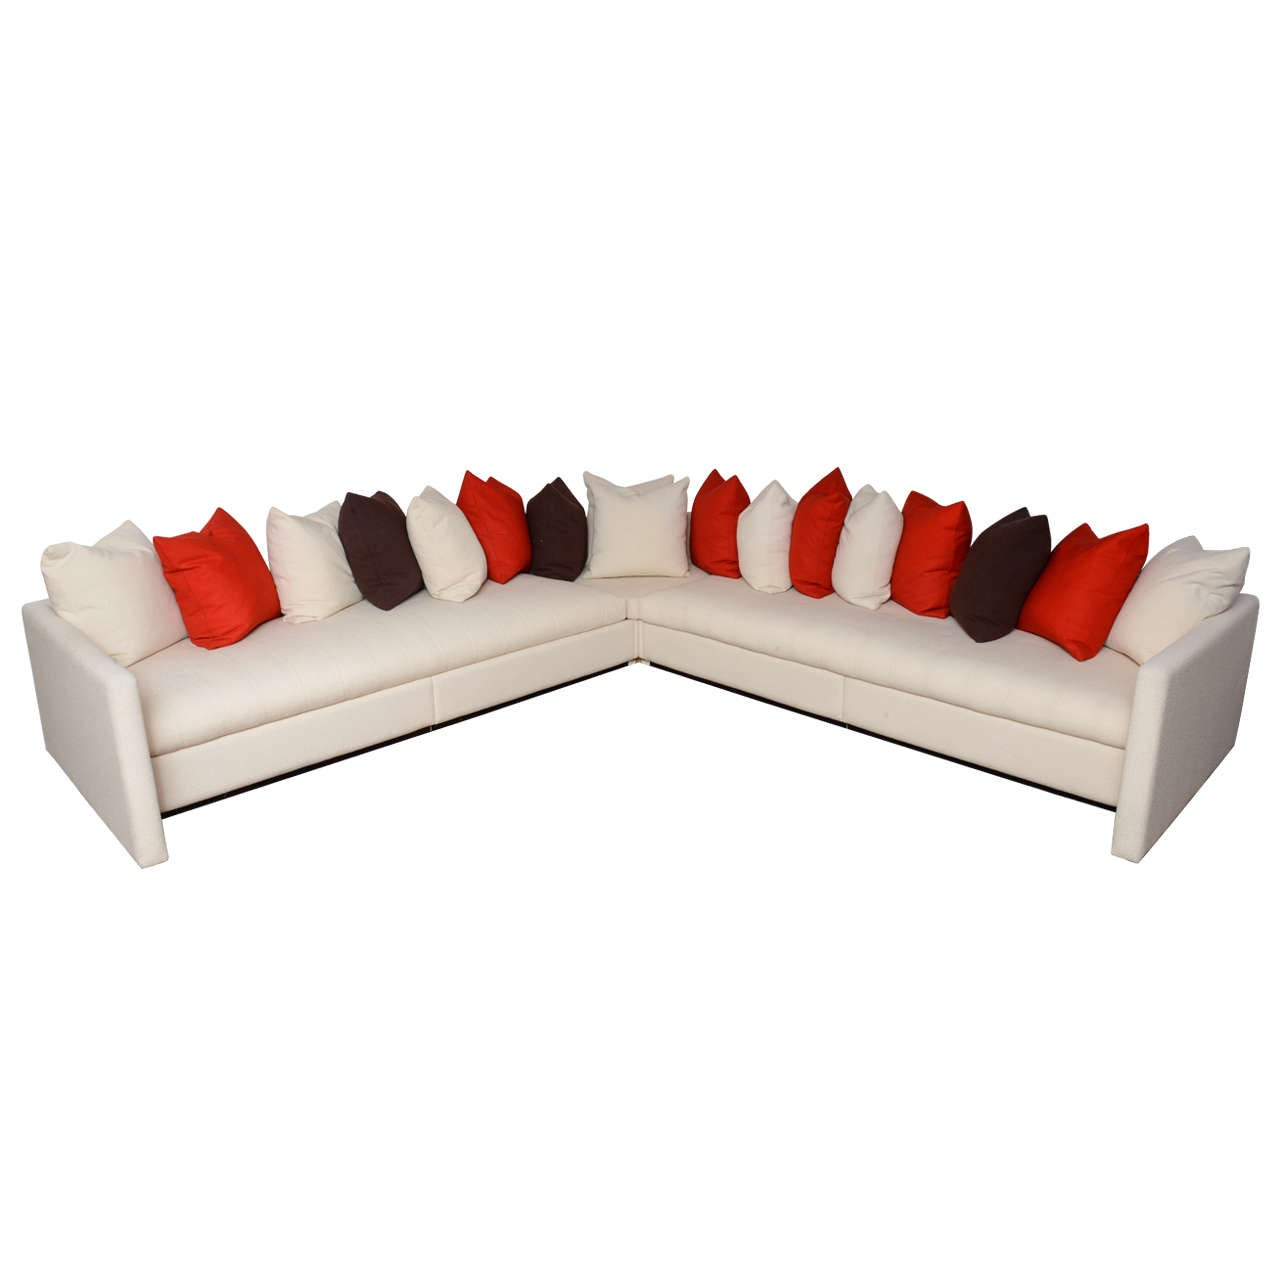 joe d u0026 39 urso sectional sofa with original knoll fabric at